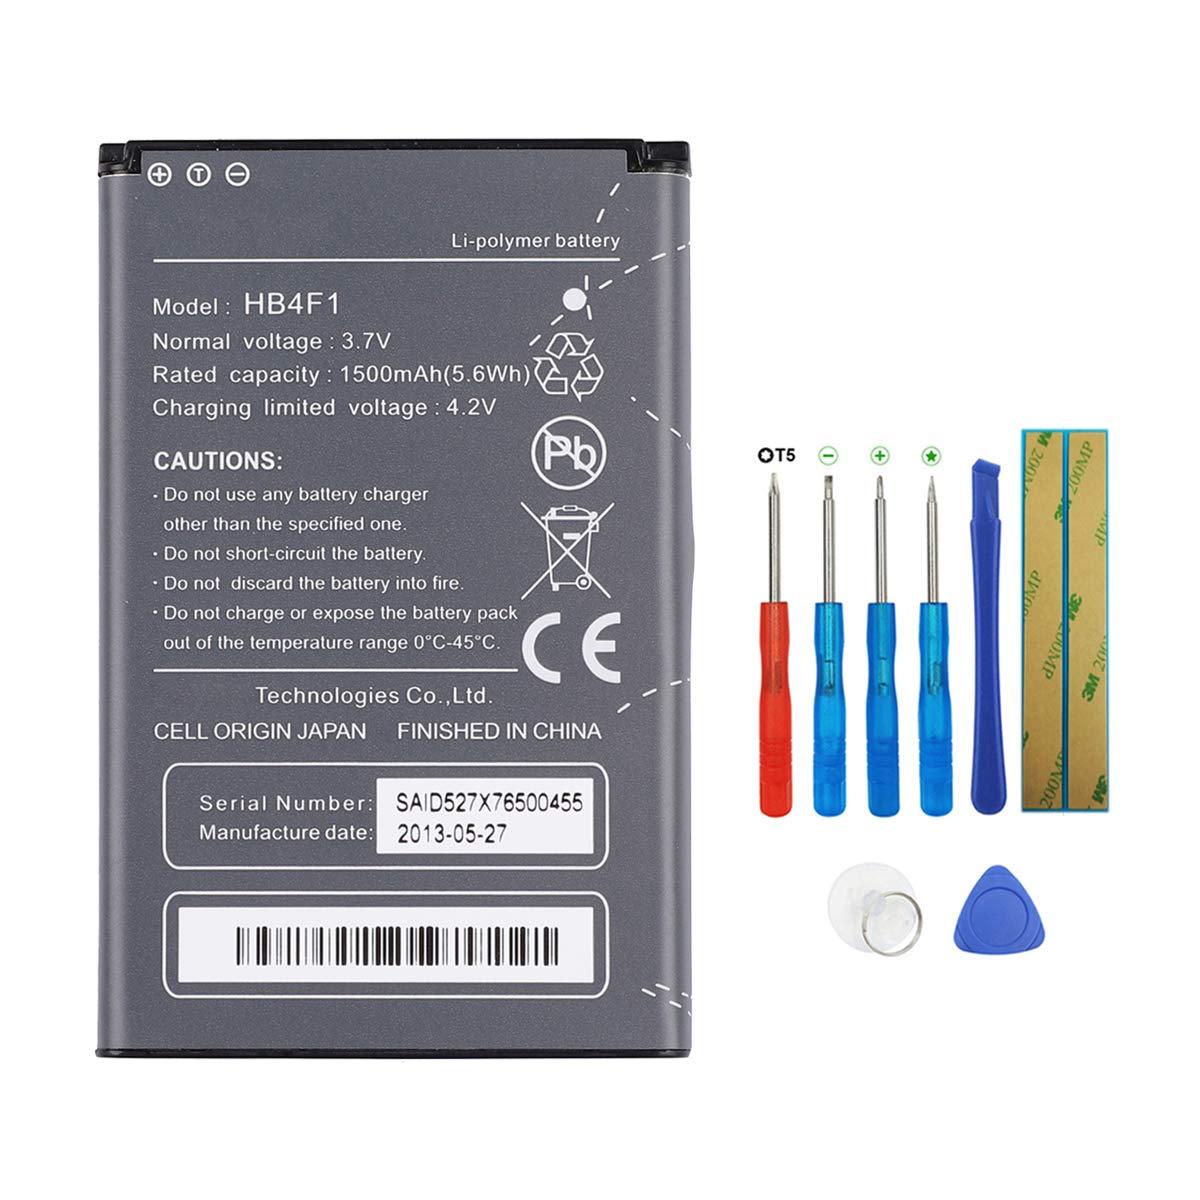 Trekstor WLAN E6939 U8230 T-Mobile Pulse E5331 U8000 Bater/ía para router port/átil Hotspot HB4F1 compatible con Huawei U8220 U9120 E5832 Swark XSBoX GO con herramientas E5830 E583X